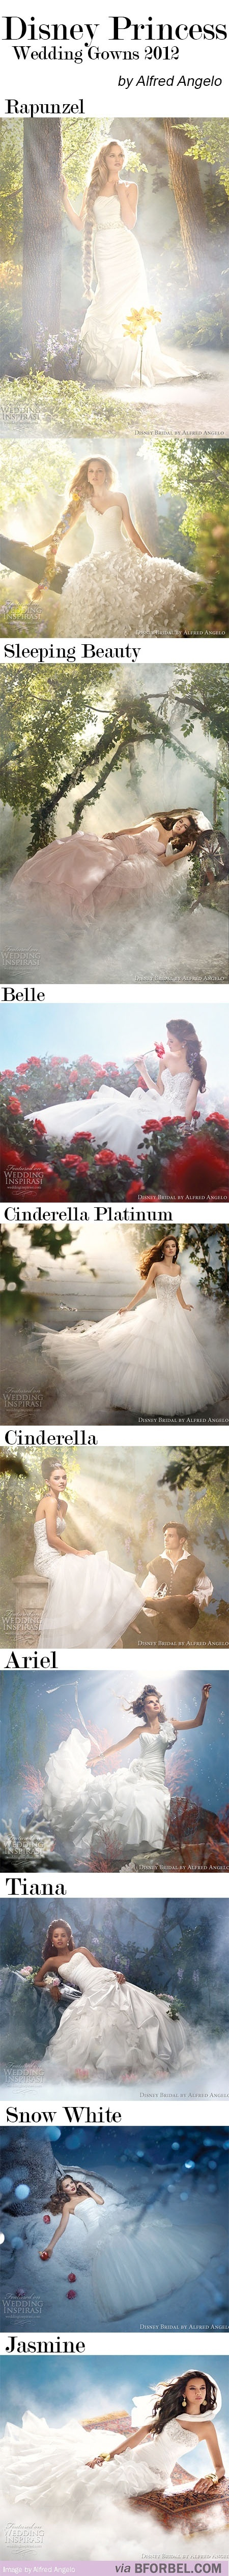 Disney wedding dresses I love Rapunzel's & Sleepy Beauty's